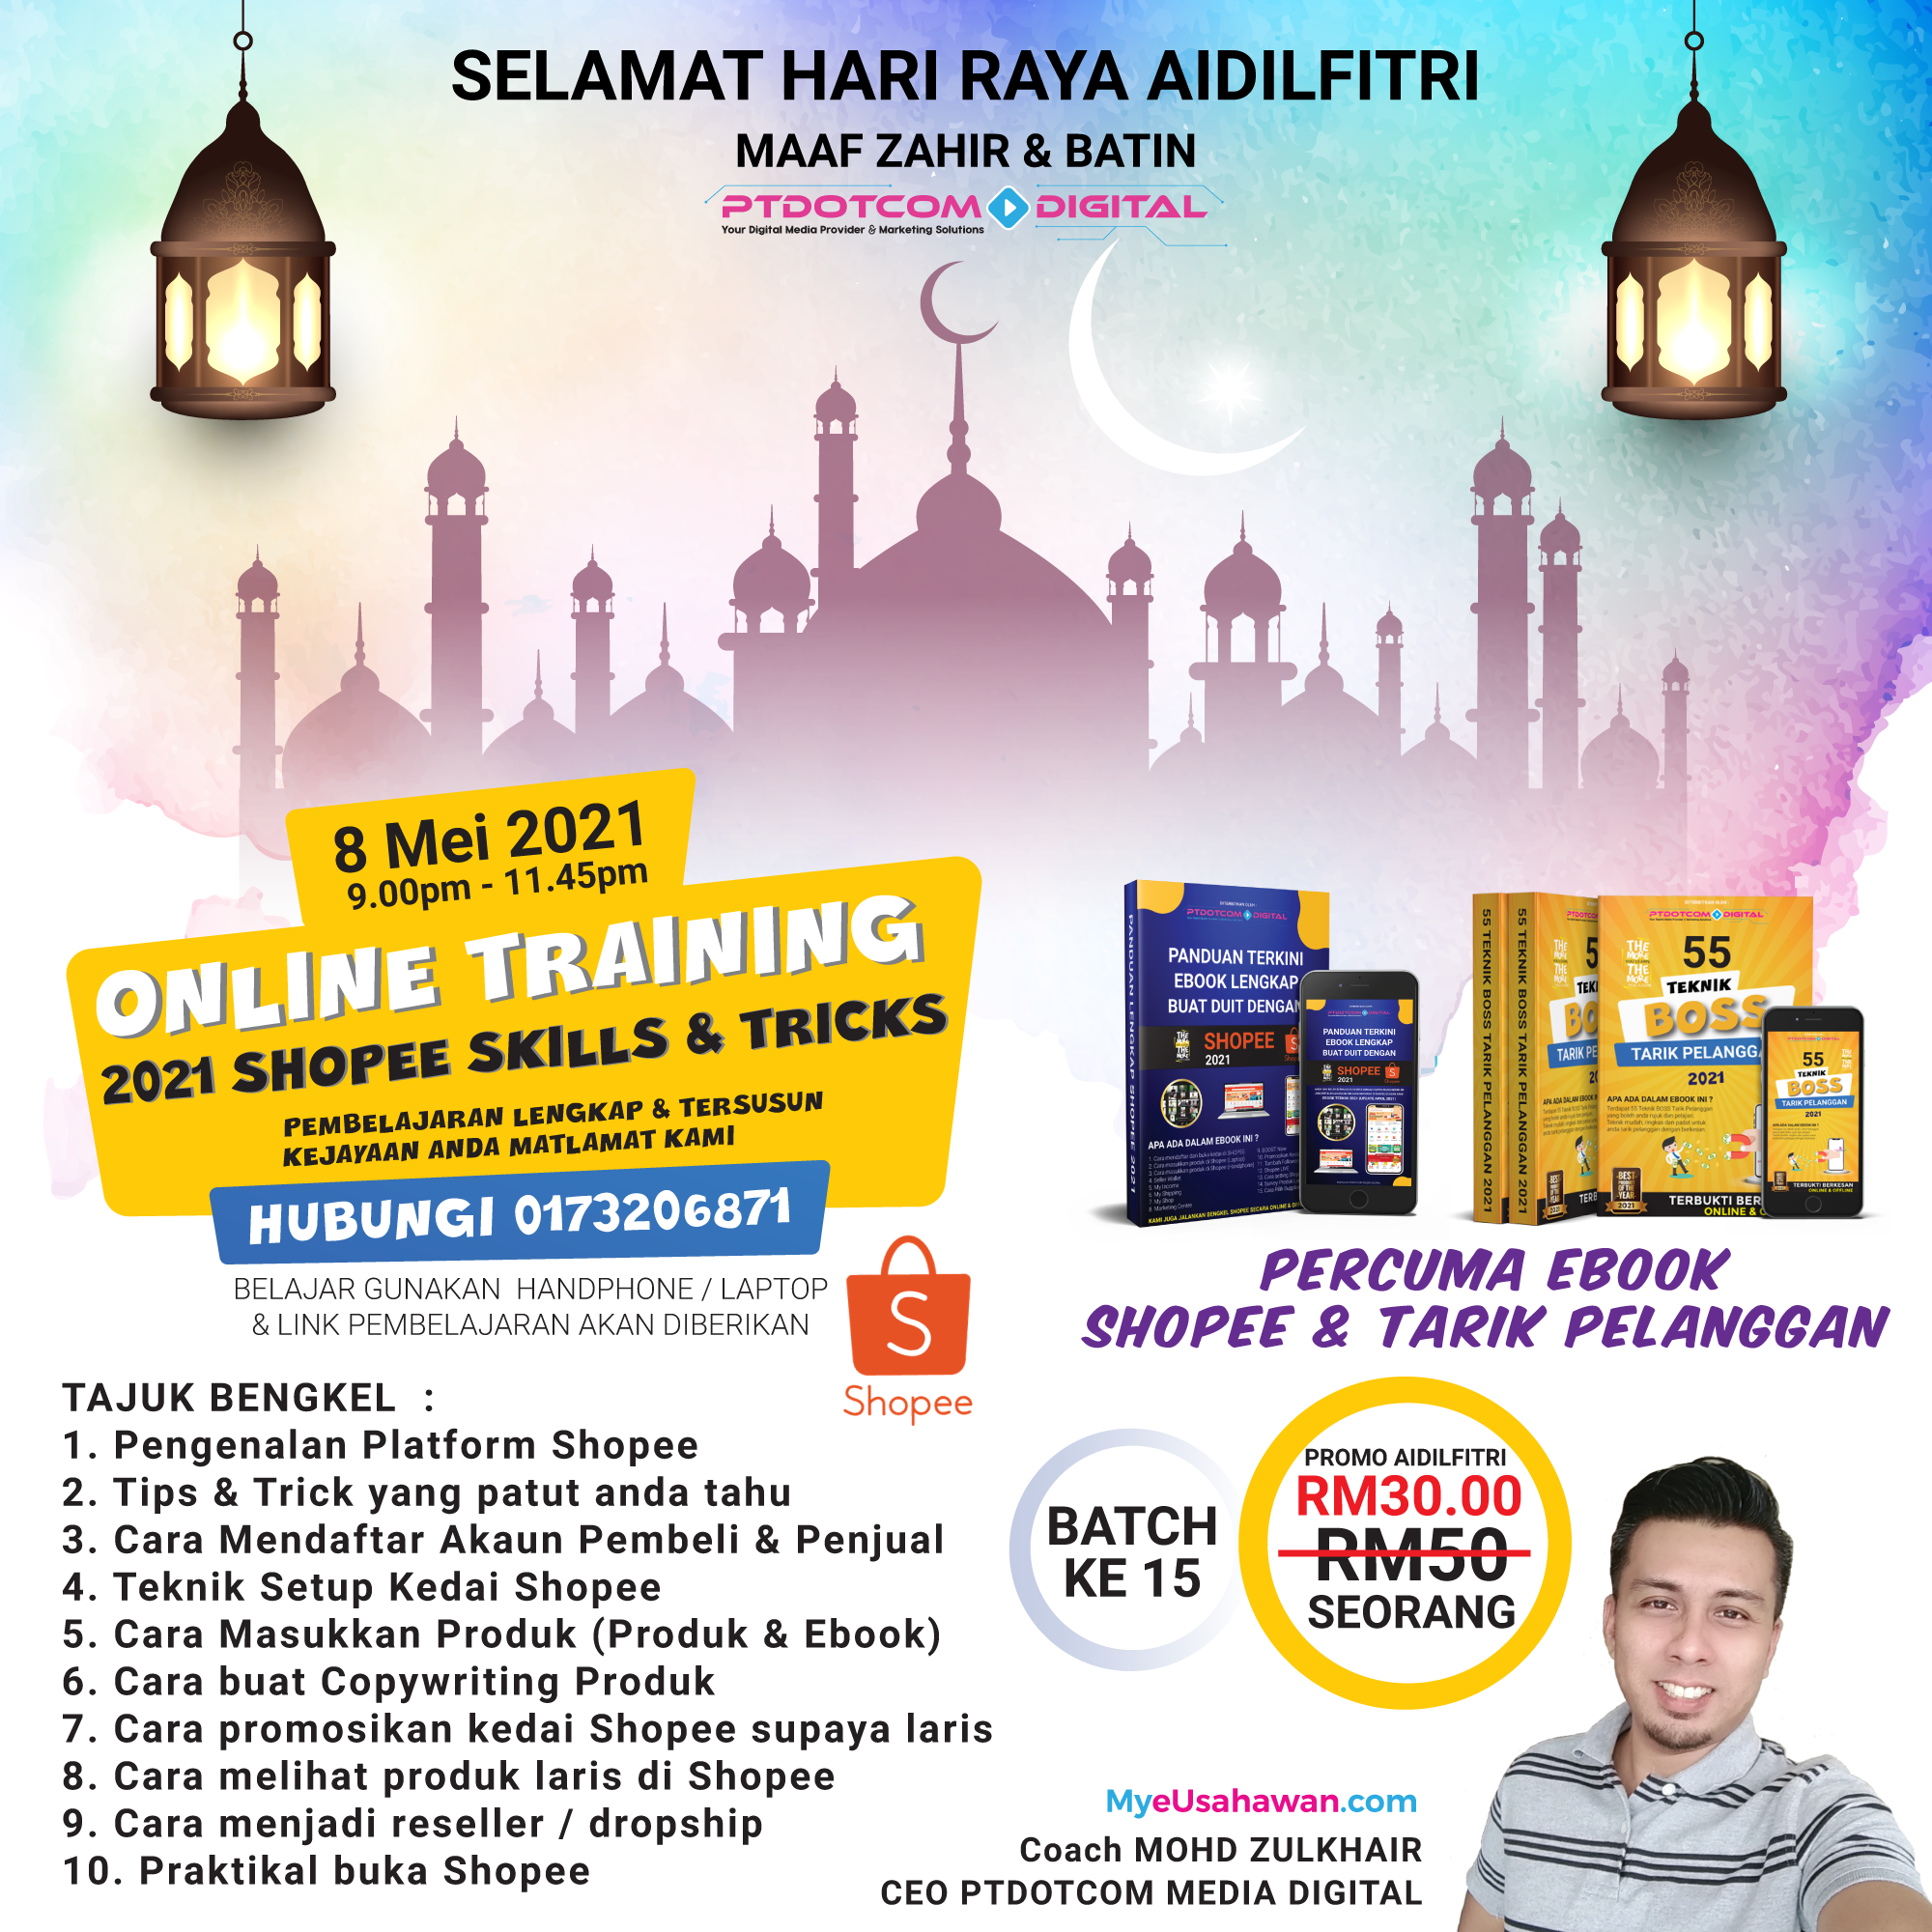 Kelas Online Shopee Murah & Lengkap